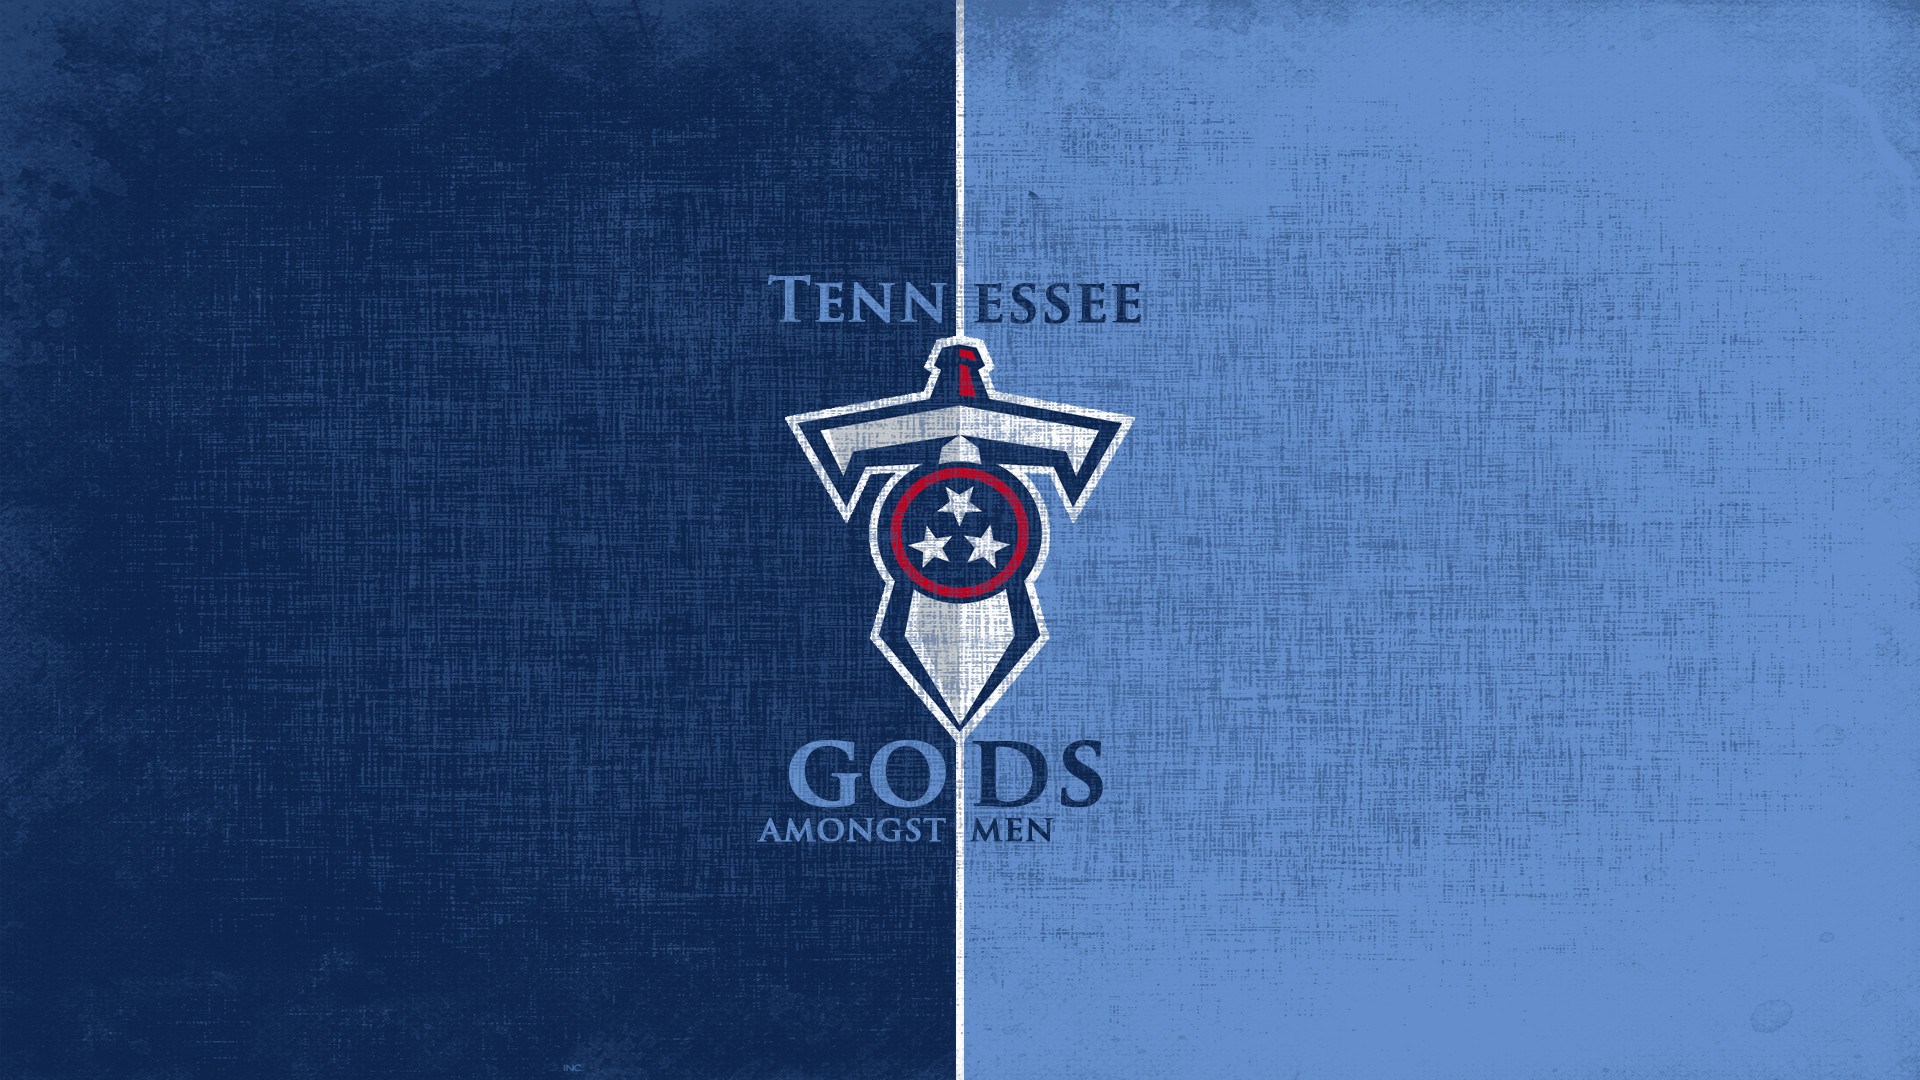 TENNESSEE TITANS nfl football dh wallpaper     158131 .